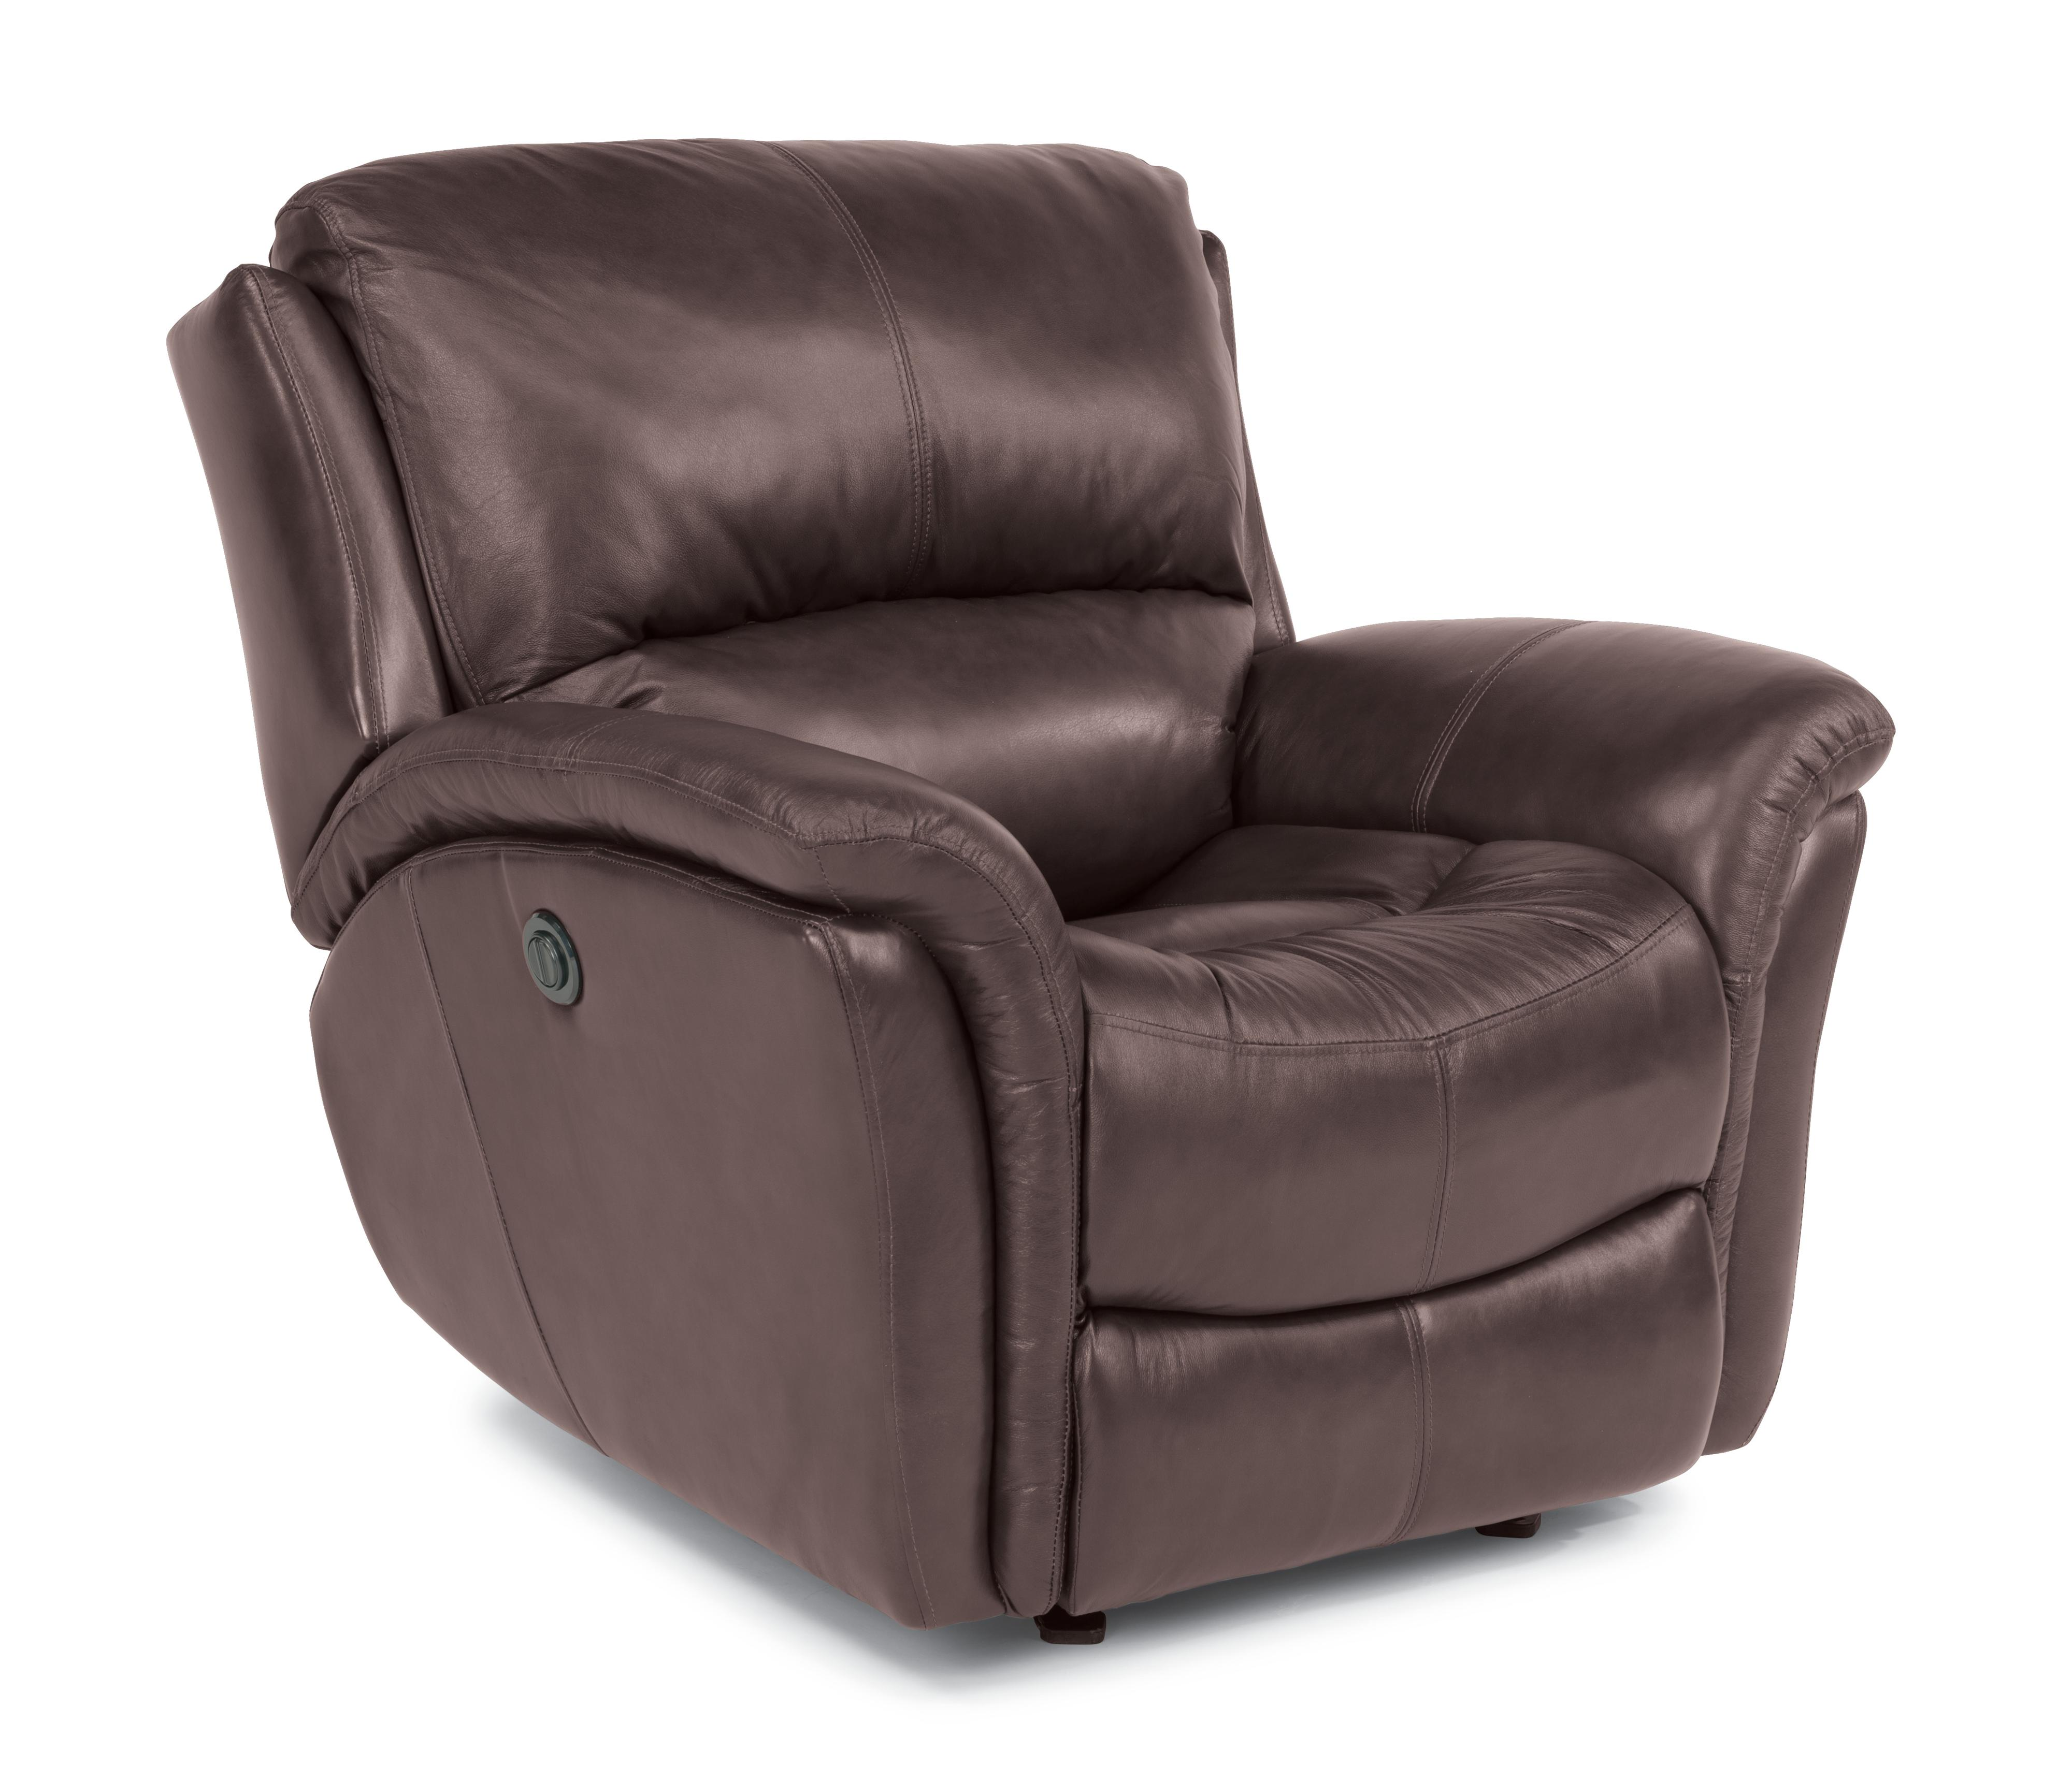 best chairs geneva glider blue metal flexsteel dominique 660344646 casual recliner